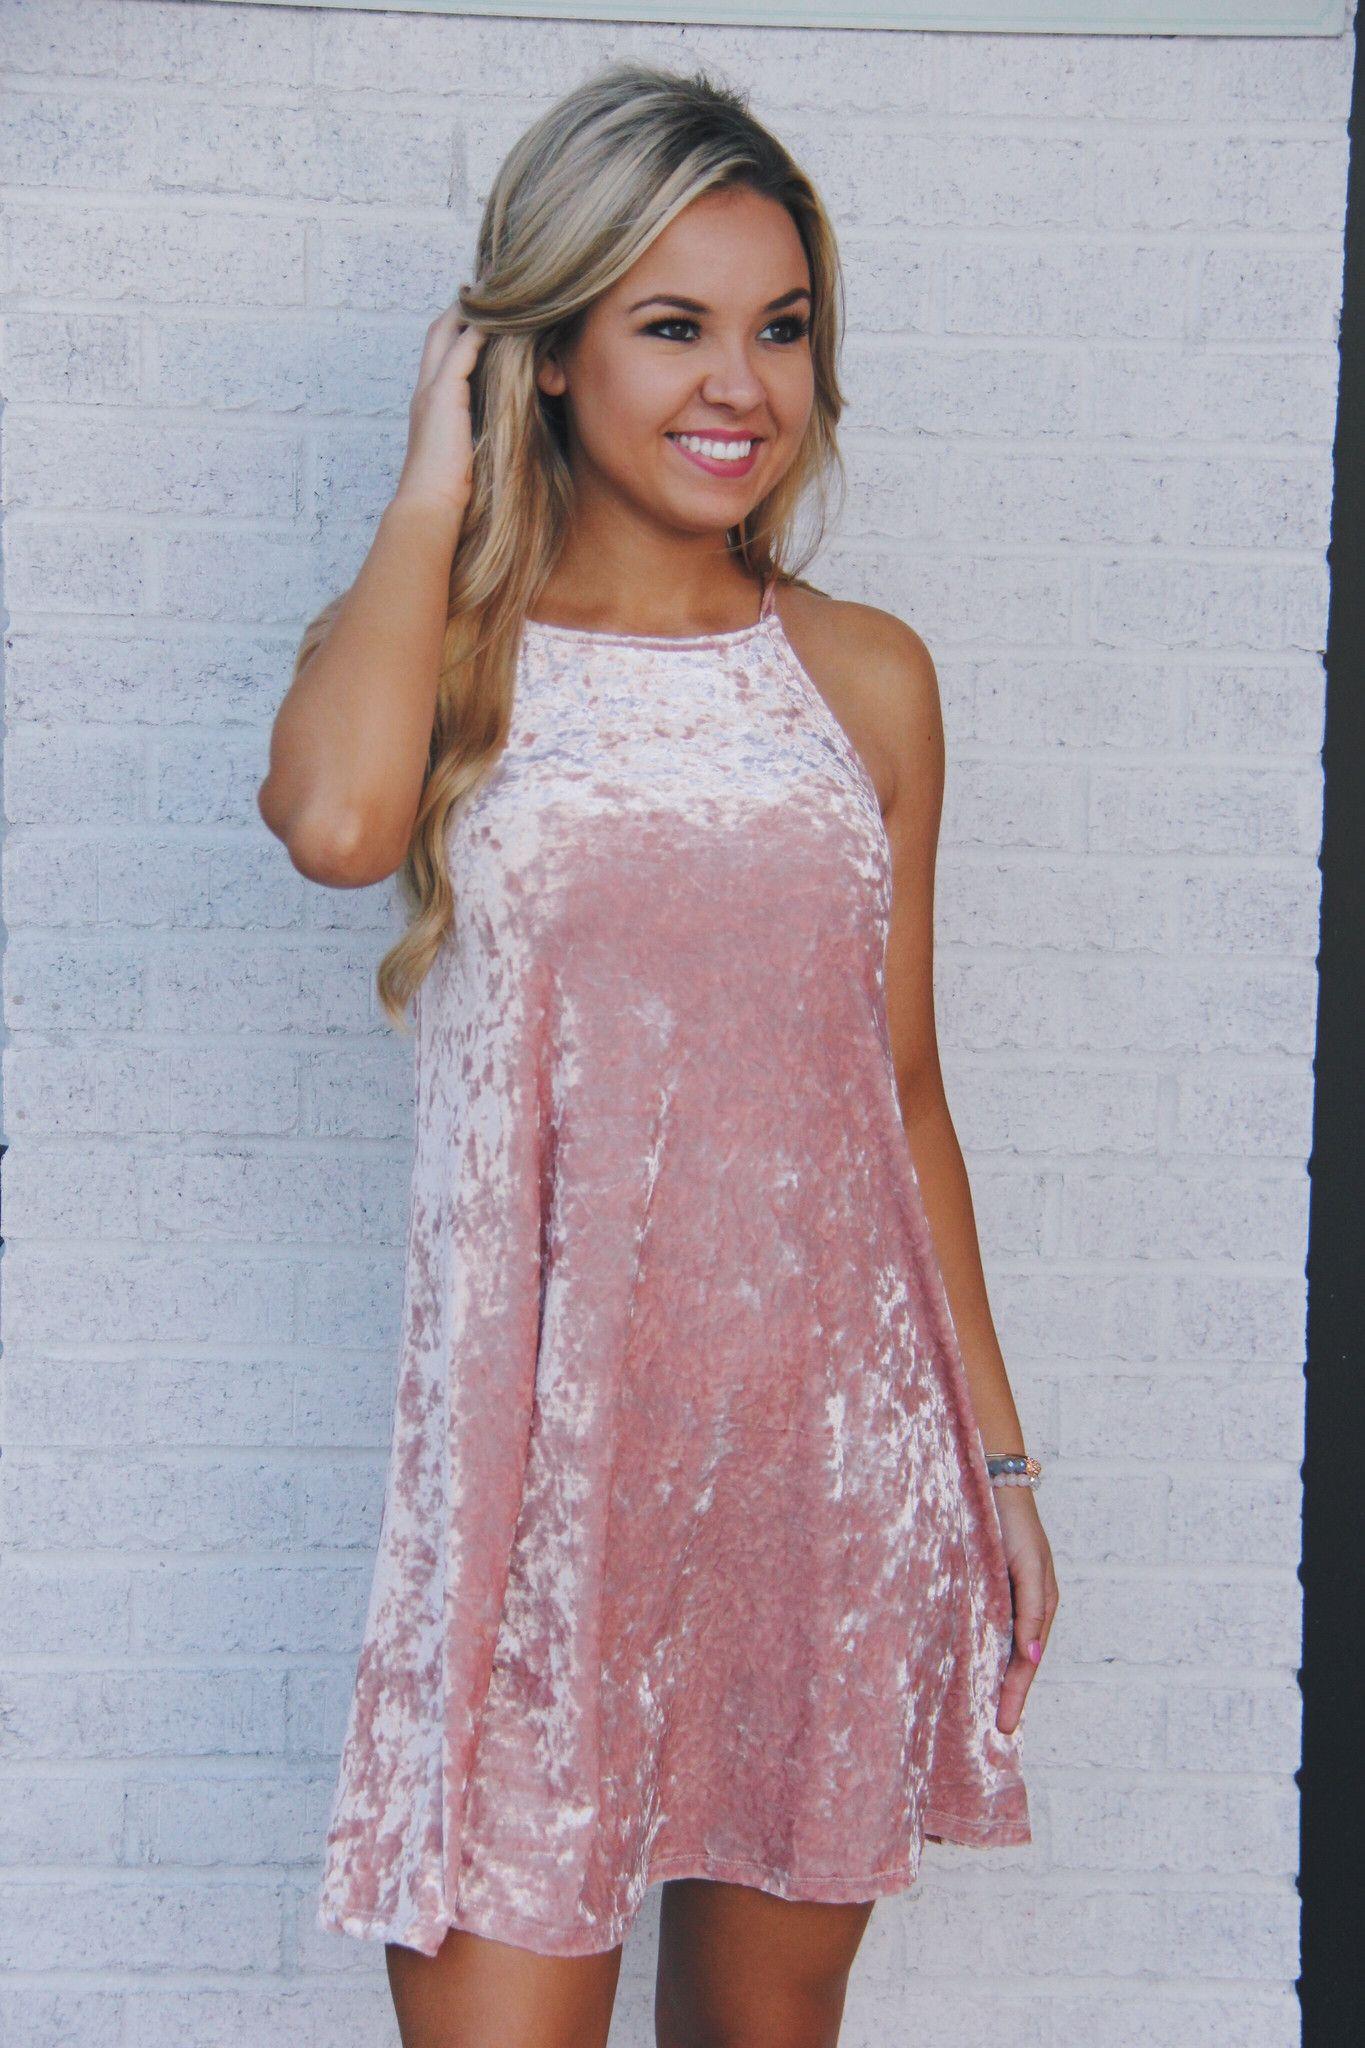 Baby pink crushed velvet tank dress - 90u0026#39;s style shopwhiskeydarling.com | Shopwhiskeydarling ...